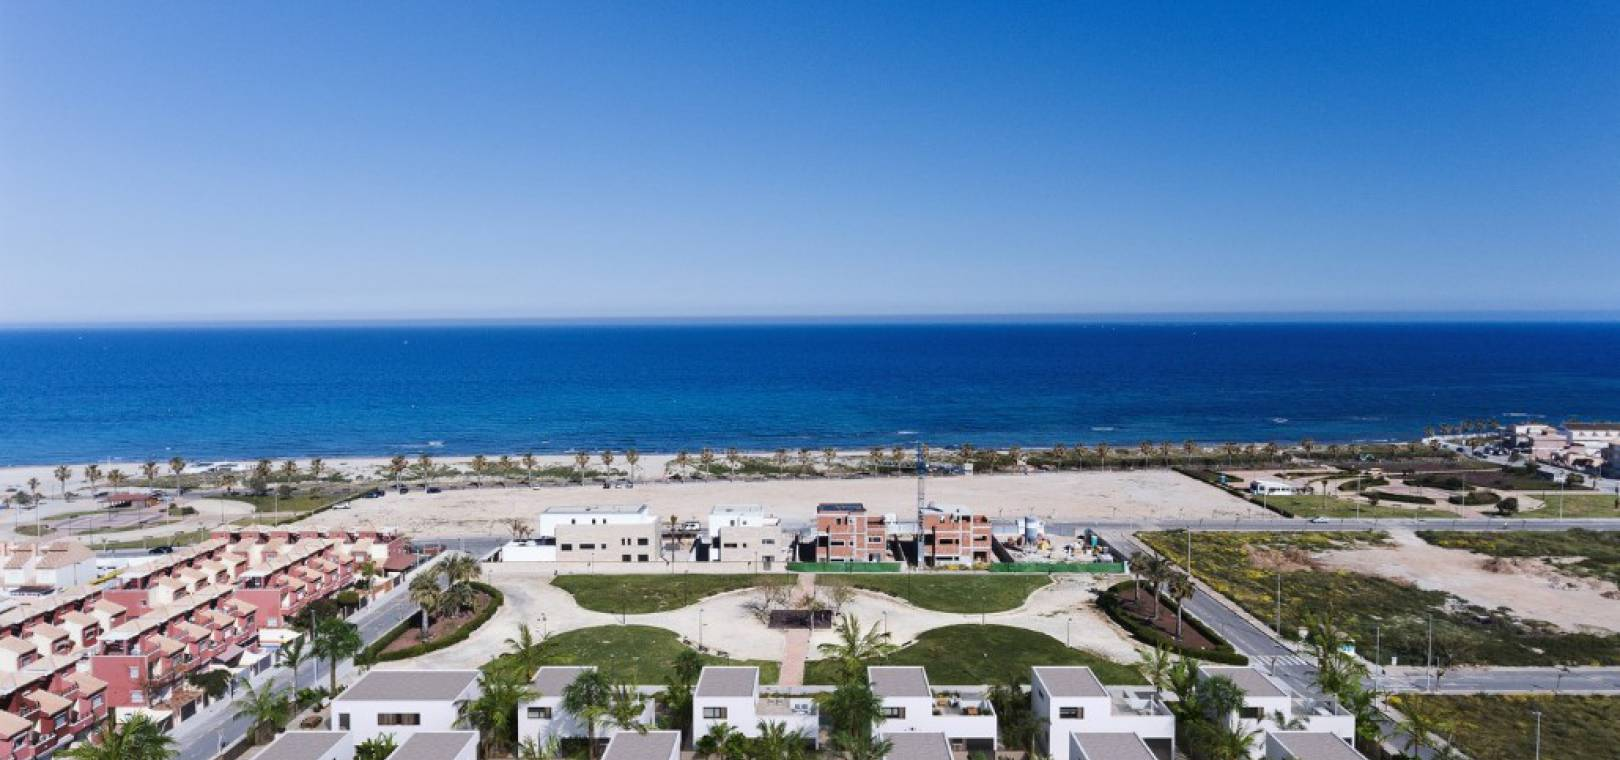 Torre_de_la_Horadada_New_Build_Luxury_Houses_For_Sale_nsp256_17